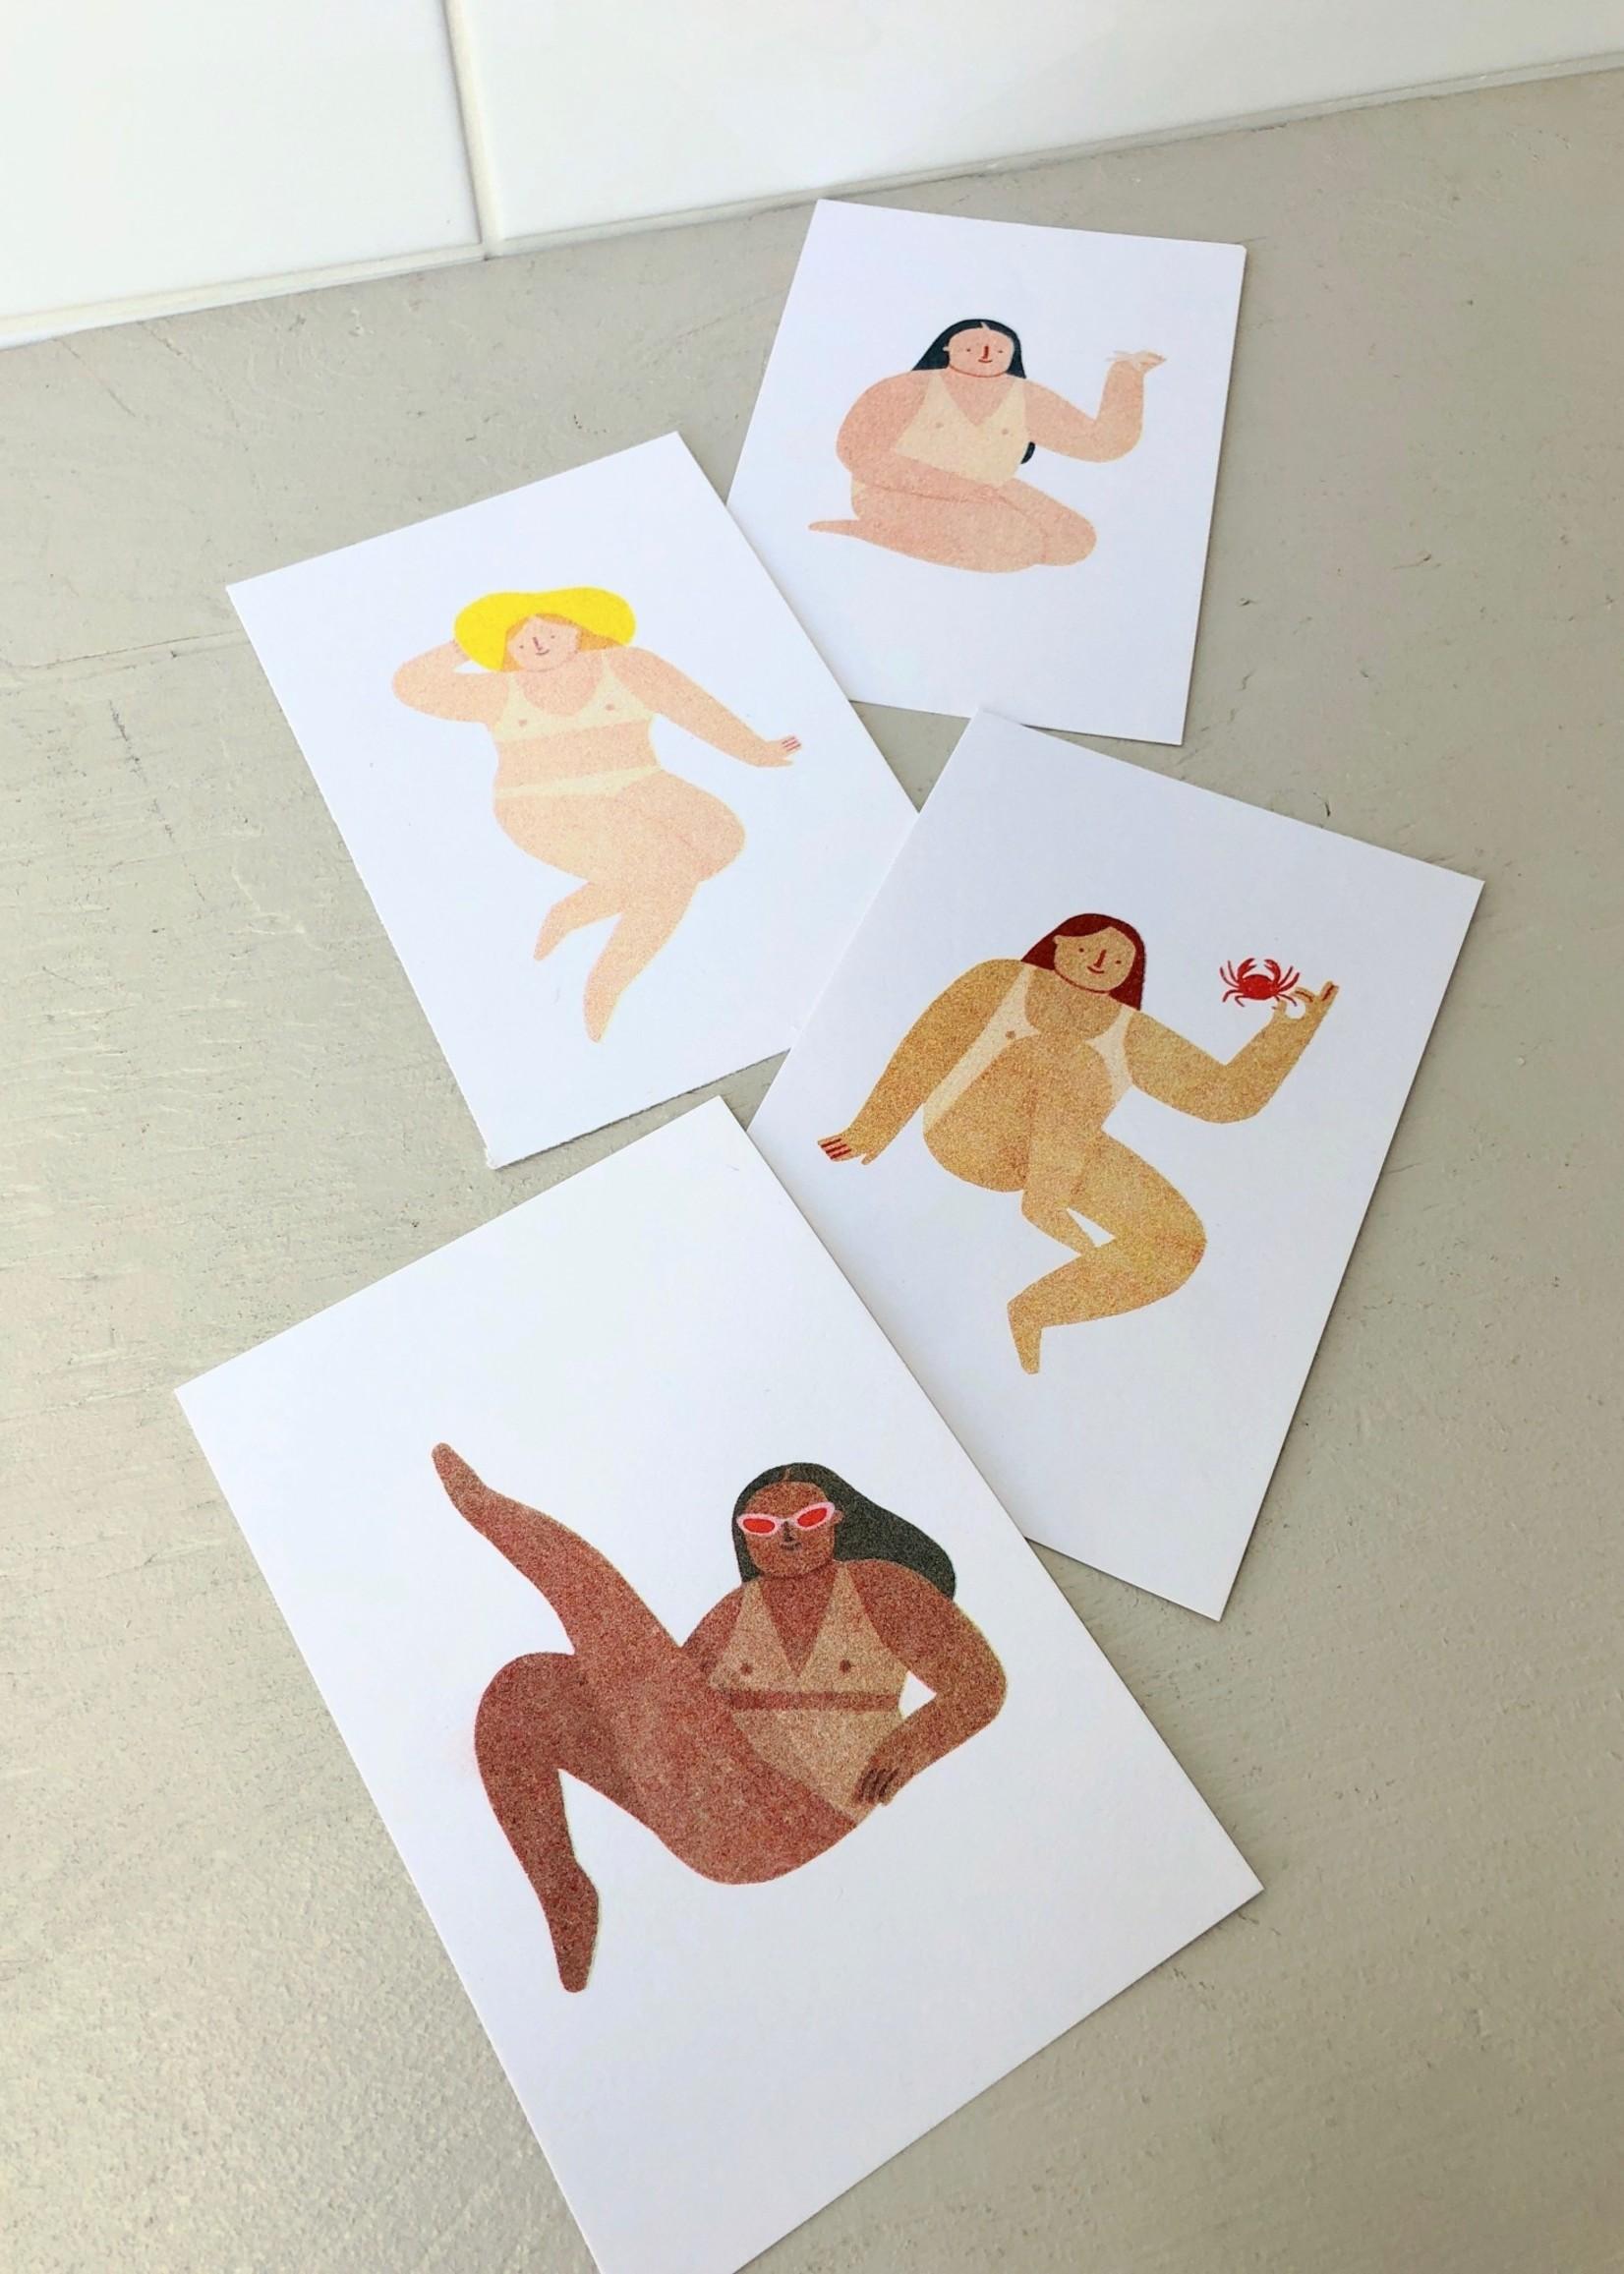 "Stay Home Club Paquet d'affichettes risographe ""Sunbathers"" par Stay Home Club, 10 x 15 cm"